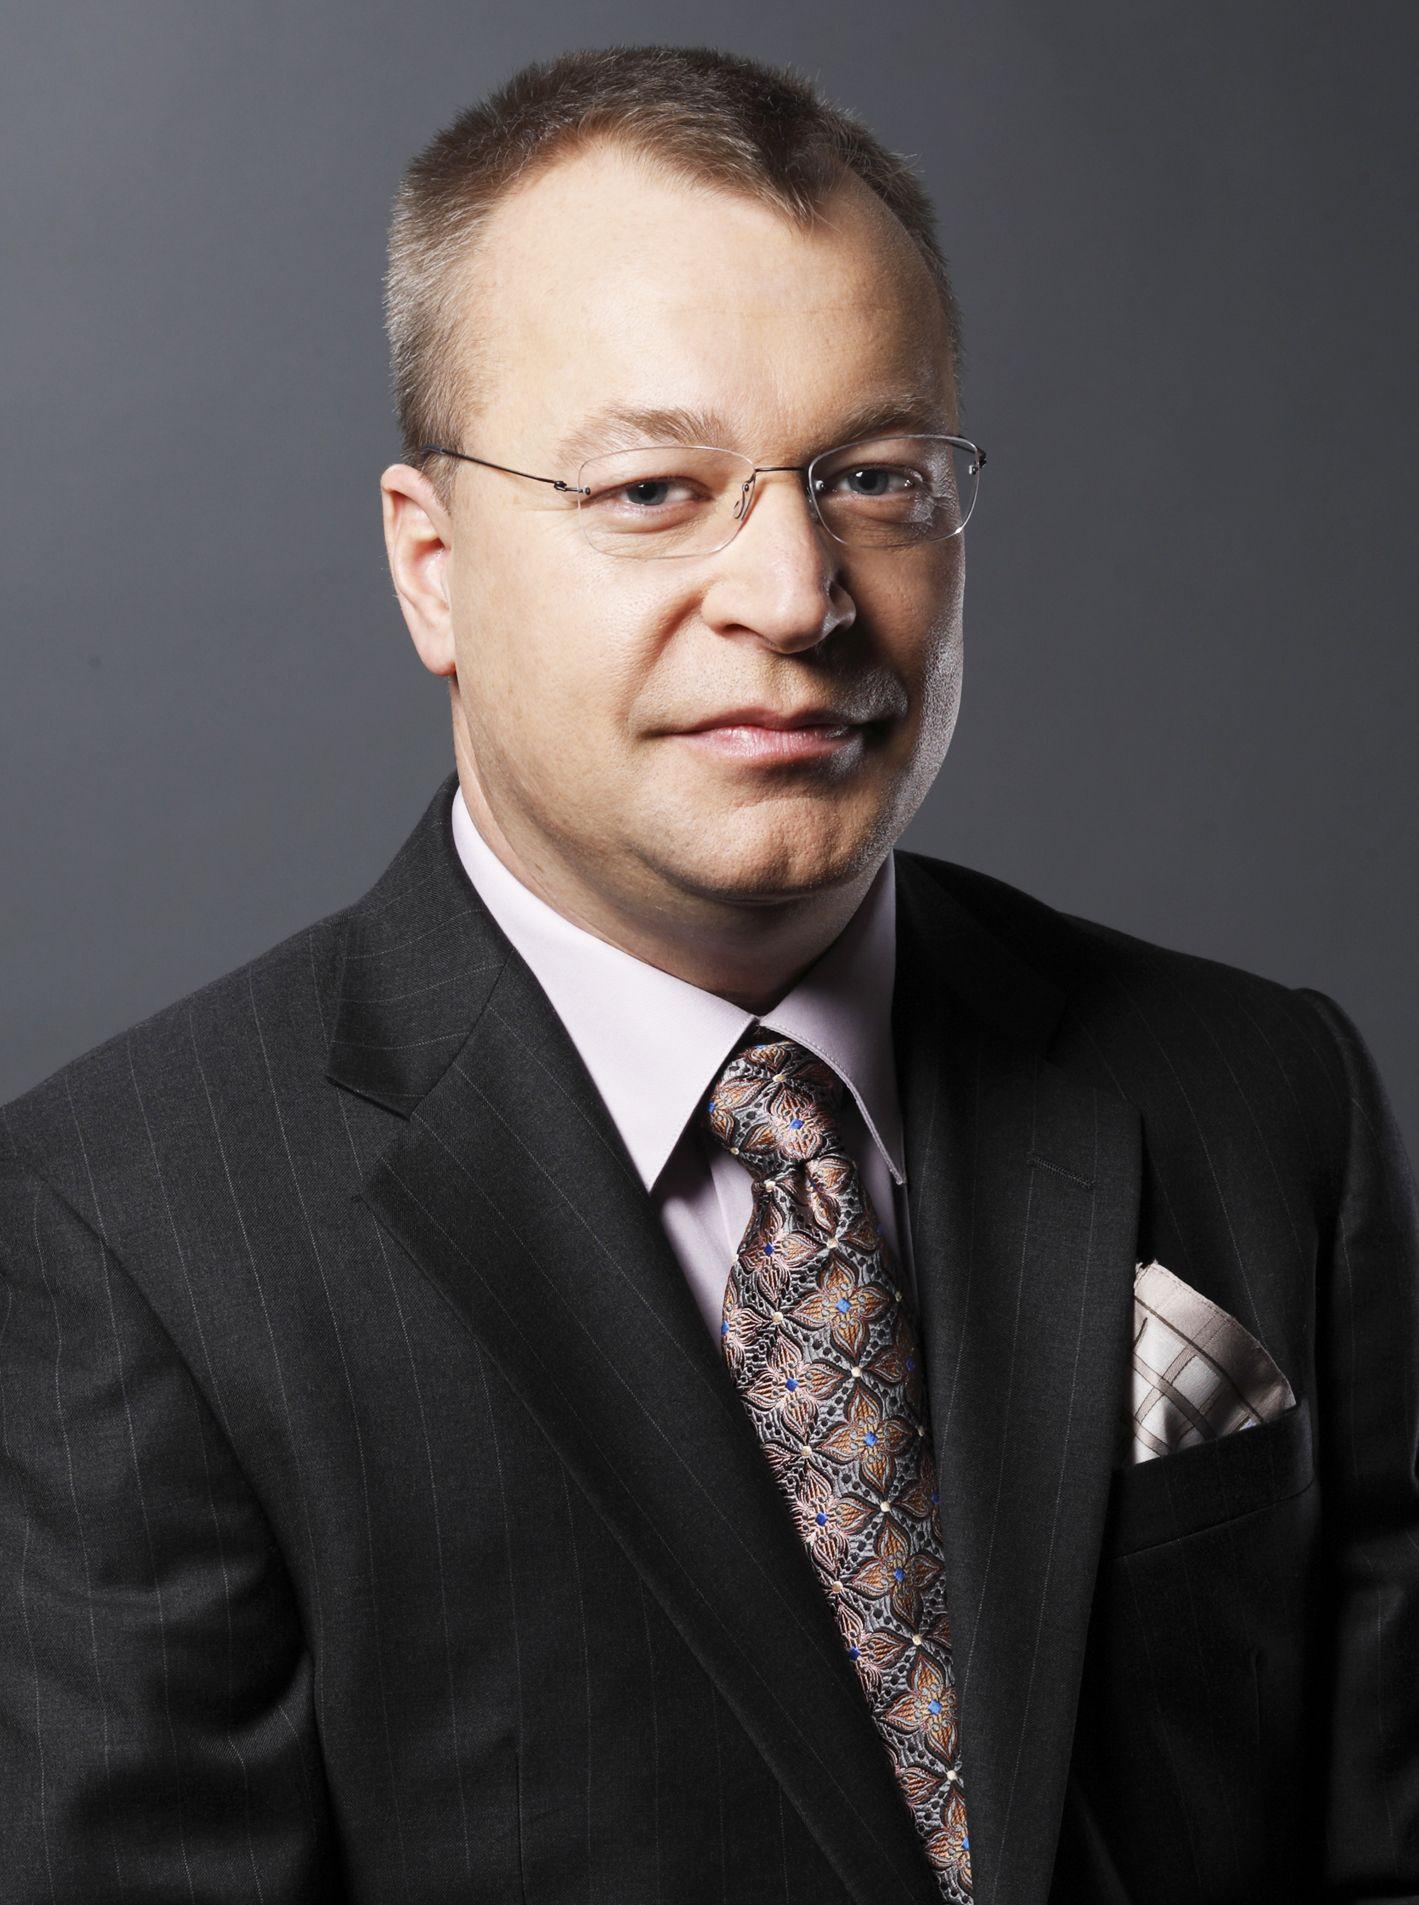 Stephen Elop / Microsoft / Nokia